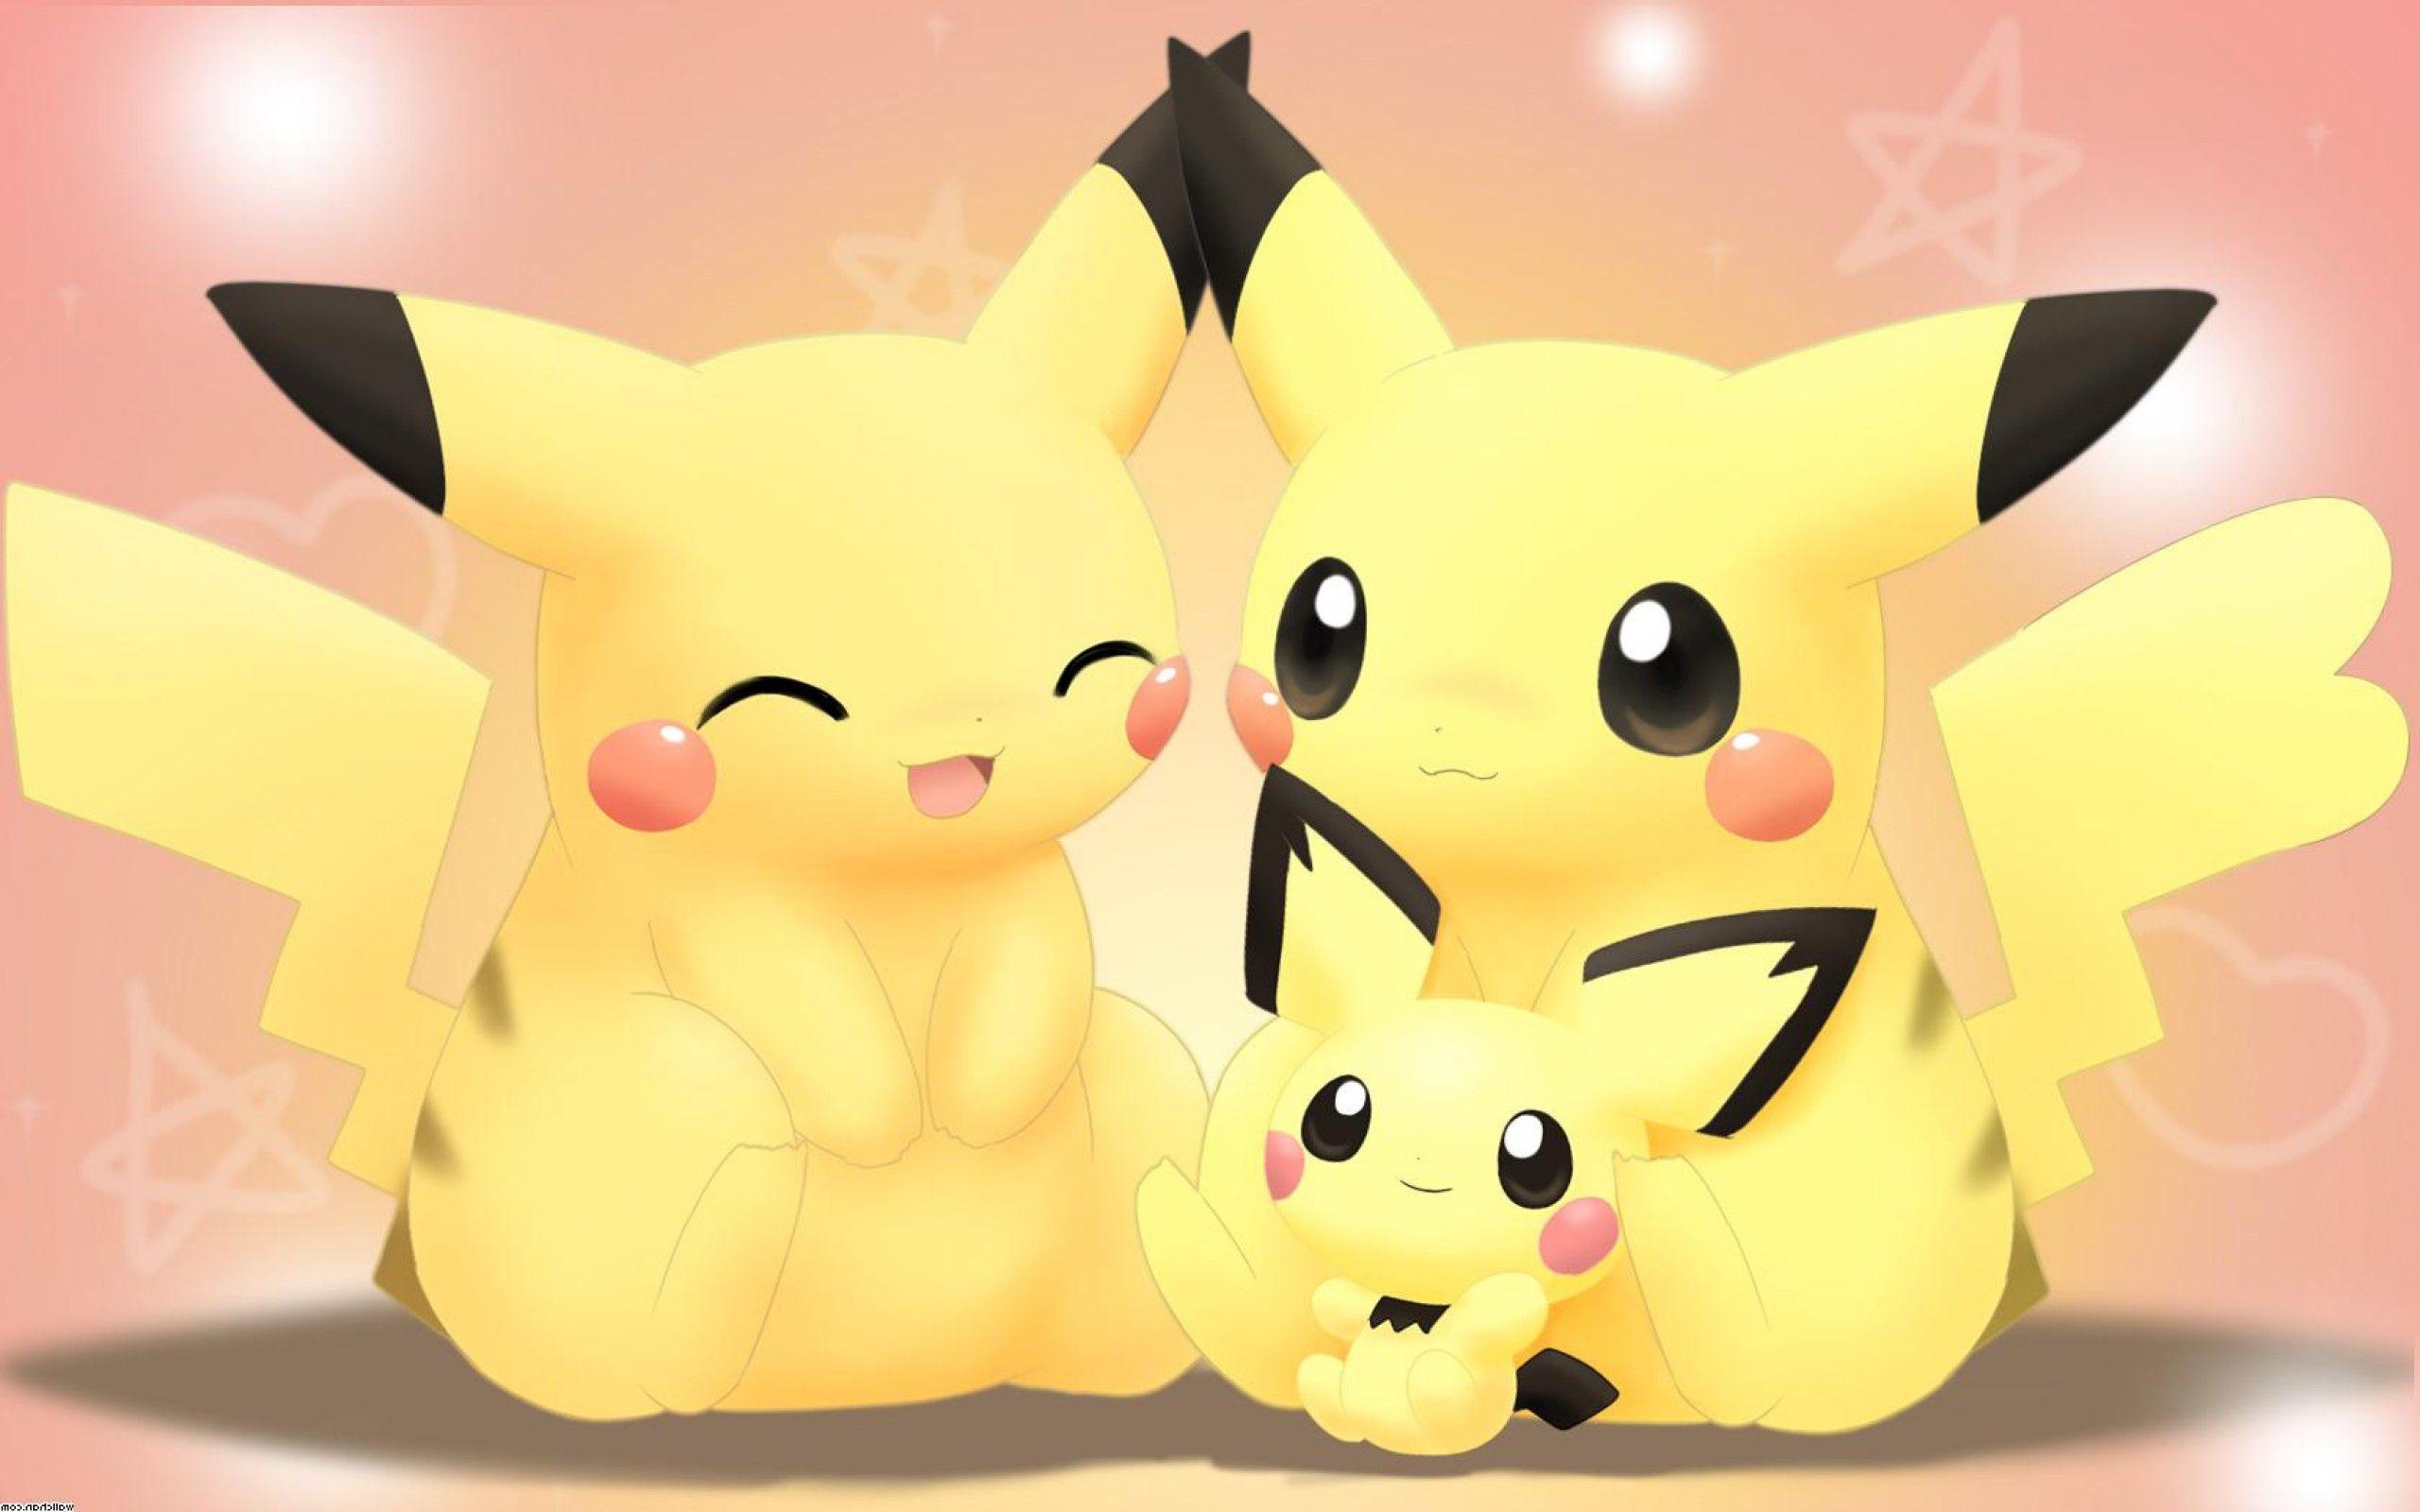 Cutest Pikachu Images Fully Hd 9 Pokemon Pikachu Wallpapers Full HD  Wallpaper Search …